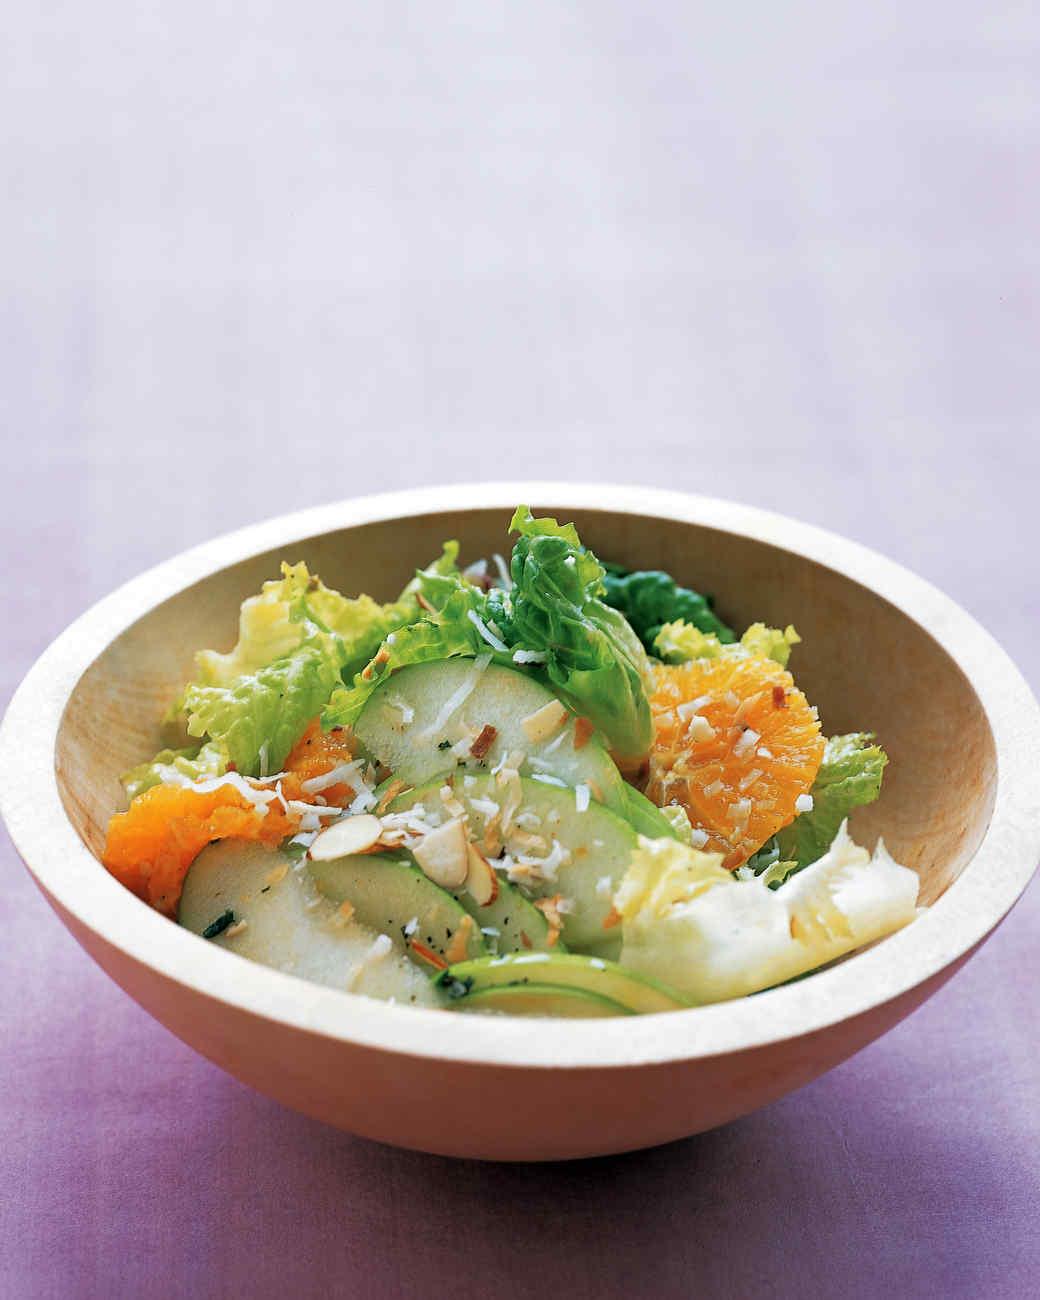 Coconut and Tangerine Salad